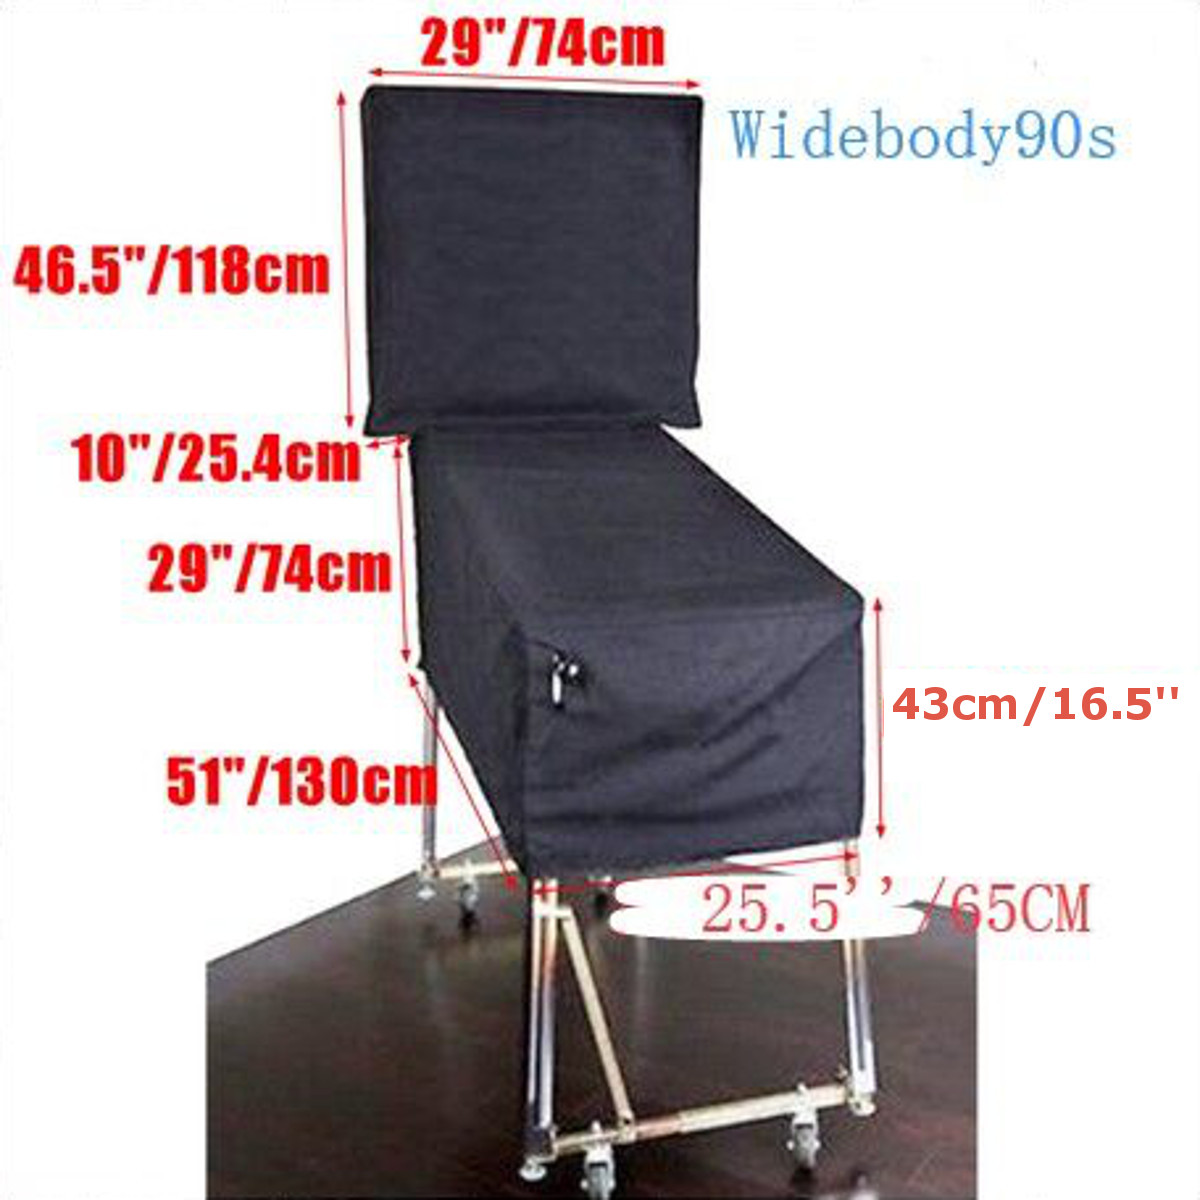 New Pinball Machine Cover Dustproof Waterproof Anti UV Outdoor For Wedgehead Gottlieb 80Bally Widebody 90/70/80s Pinball Parts